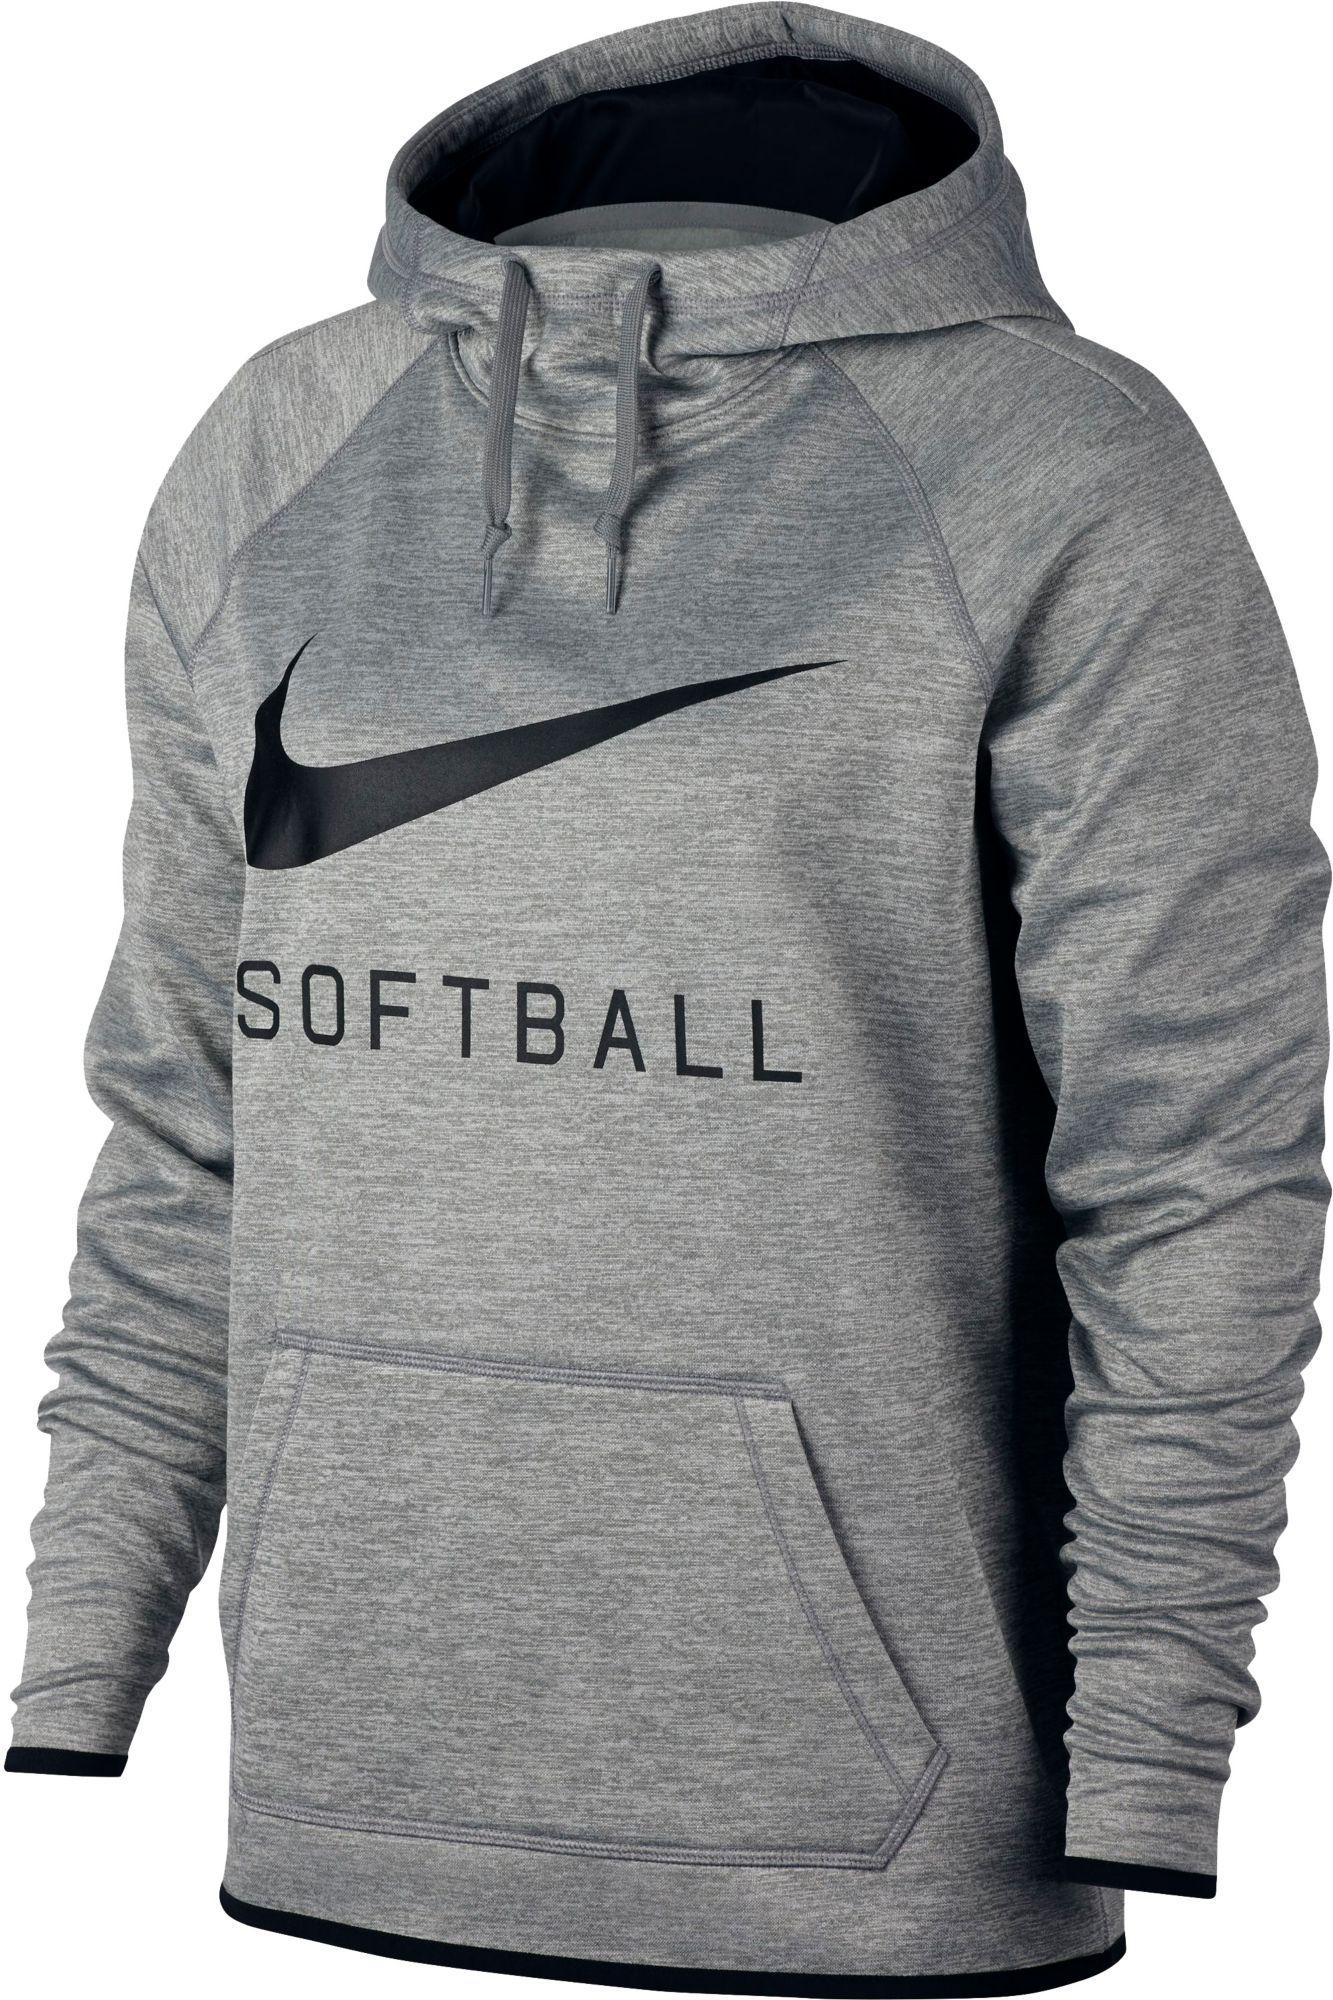 9687c3dfe1 Nike Women s Softball Pullover Hoodie